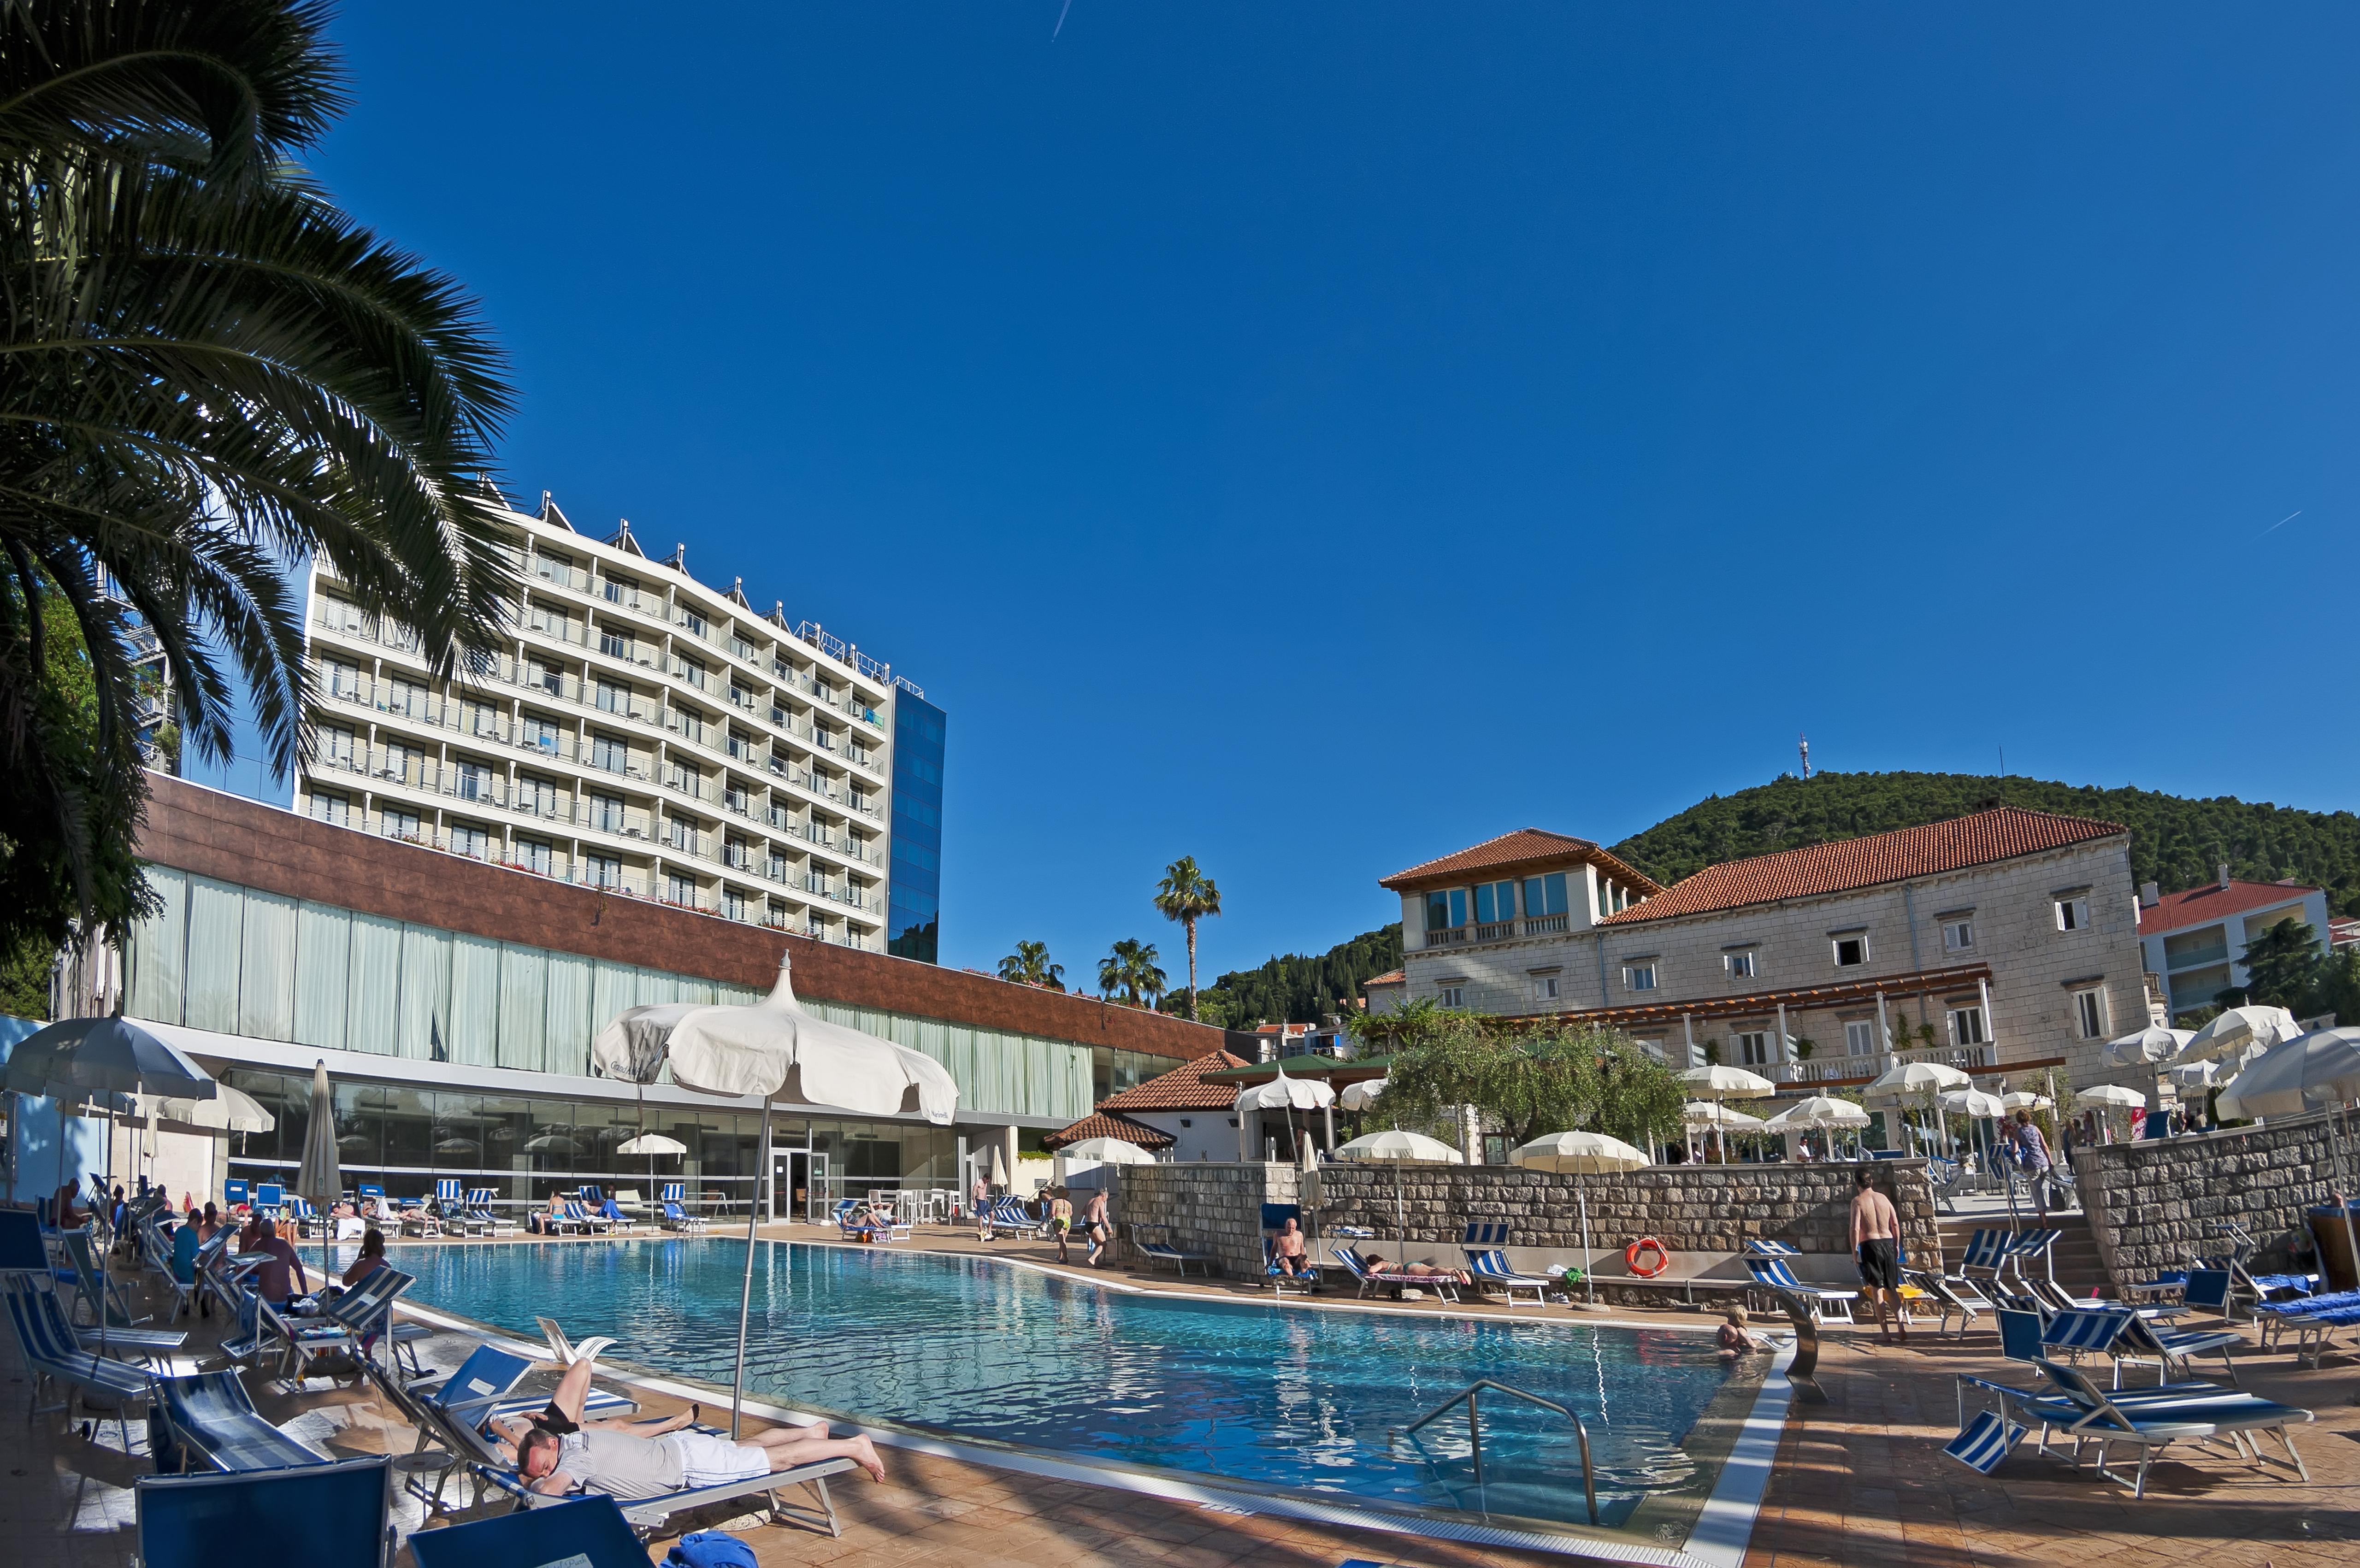 Grand Hotel Park 1